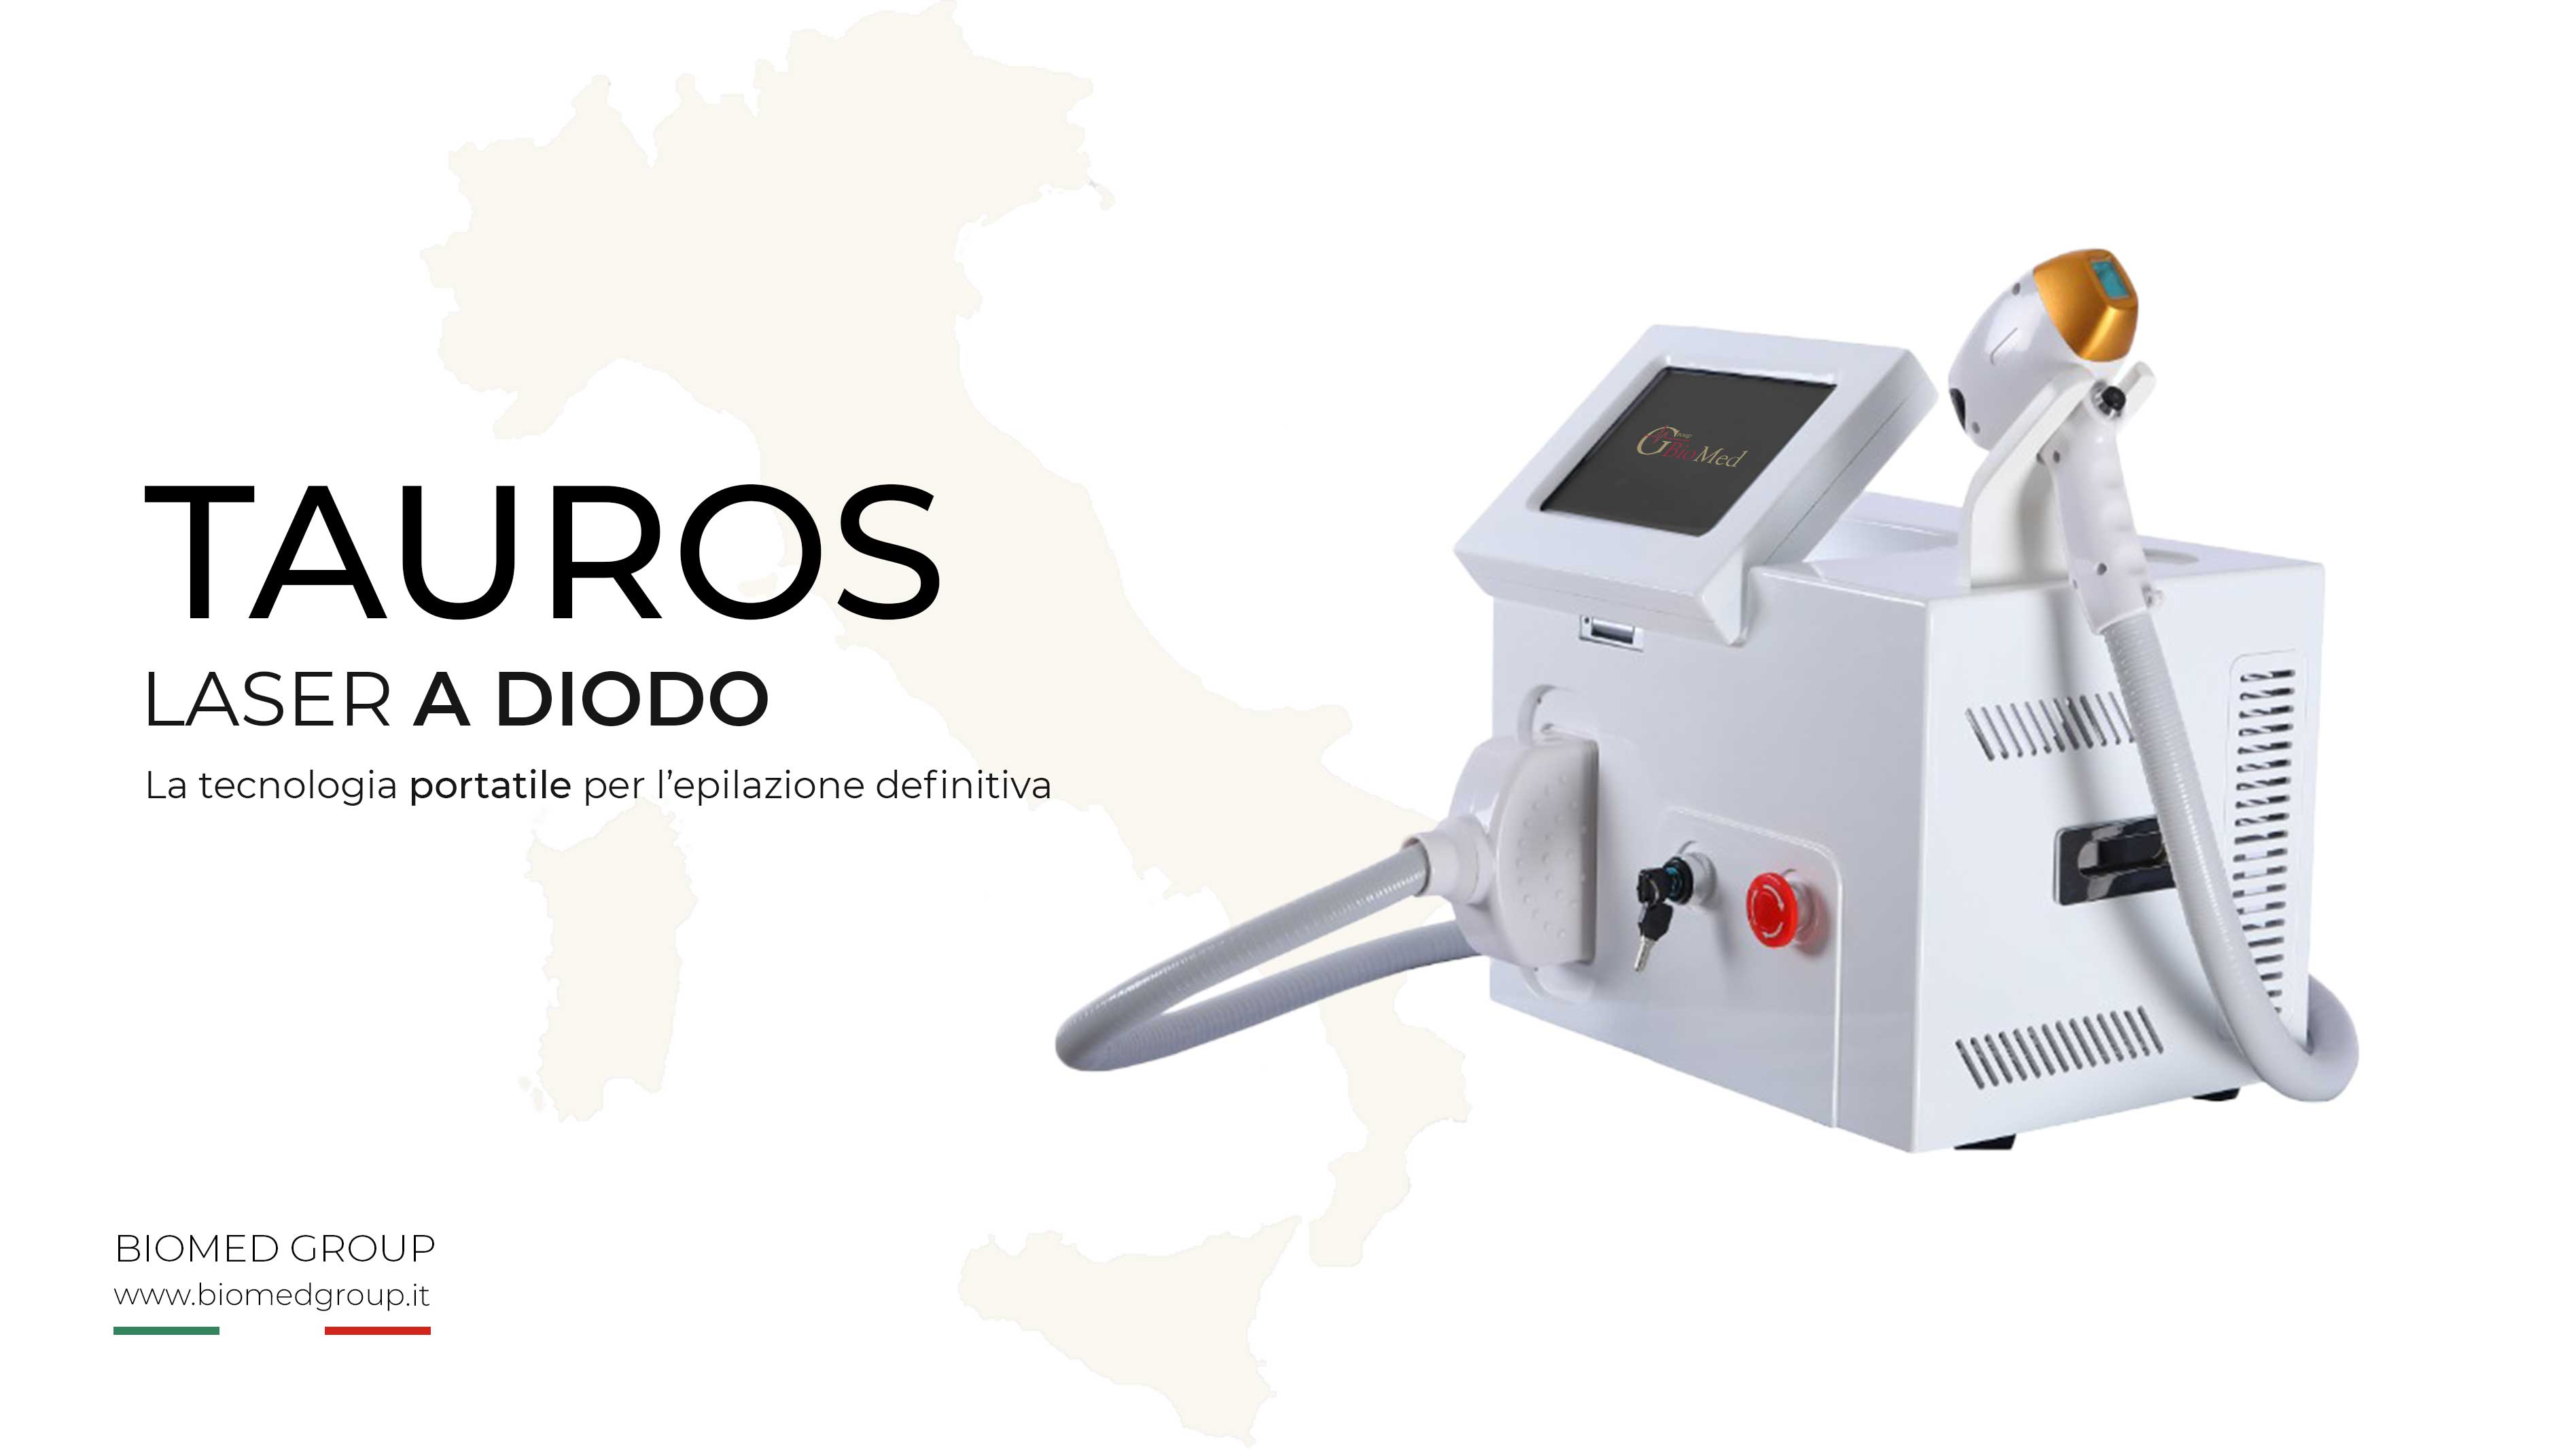 Tauros – Laser a diodo